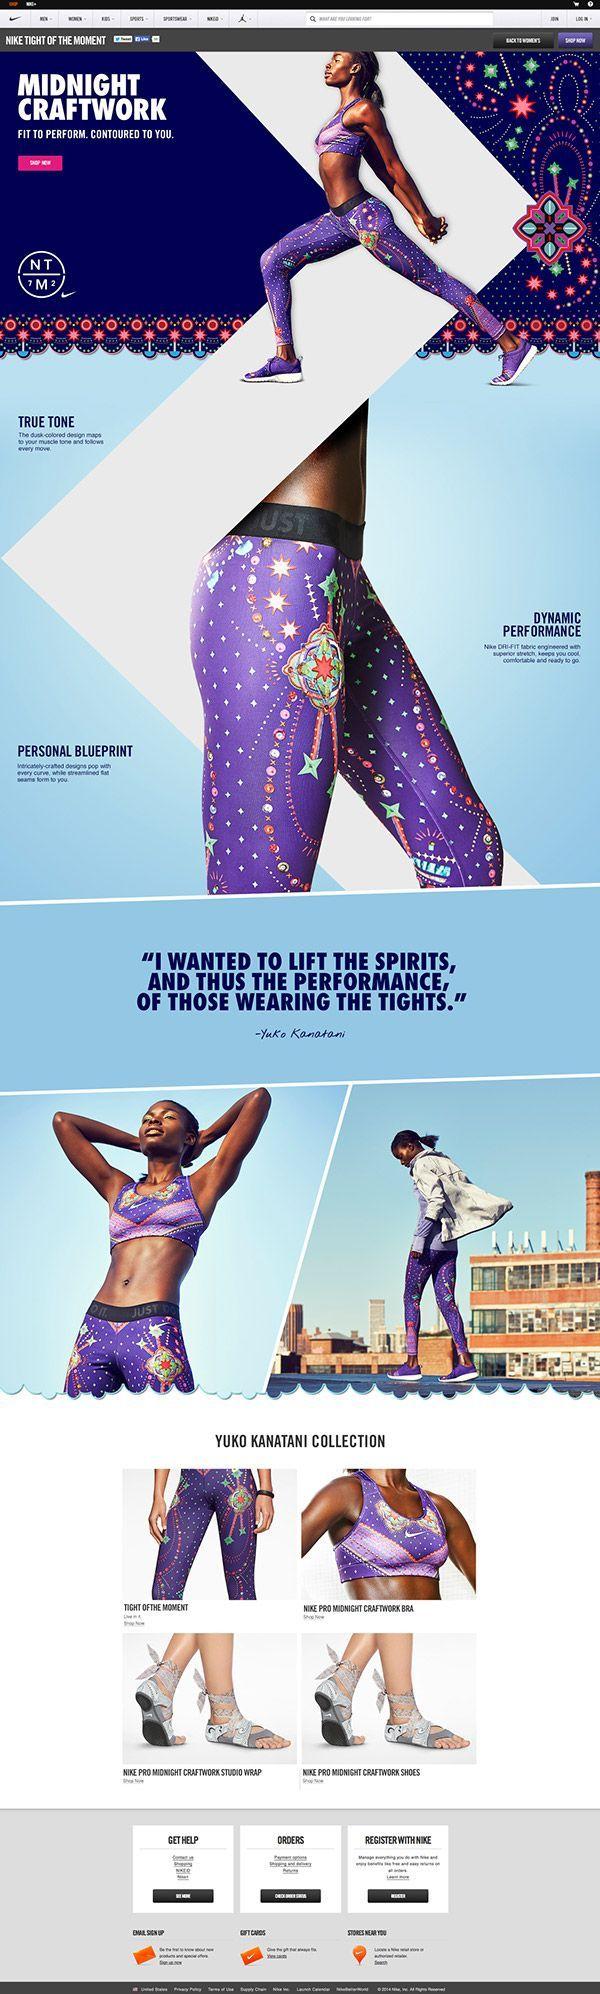 Nike: Tights of the Moment by Mariola Bruszewska, via Behance #webdesign #fresh: